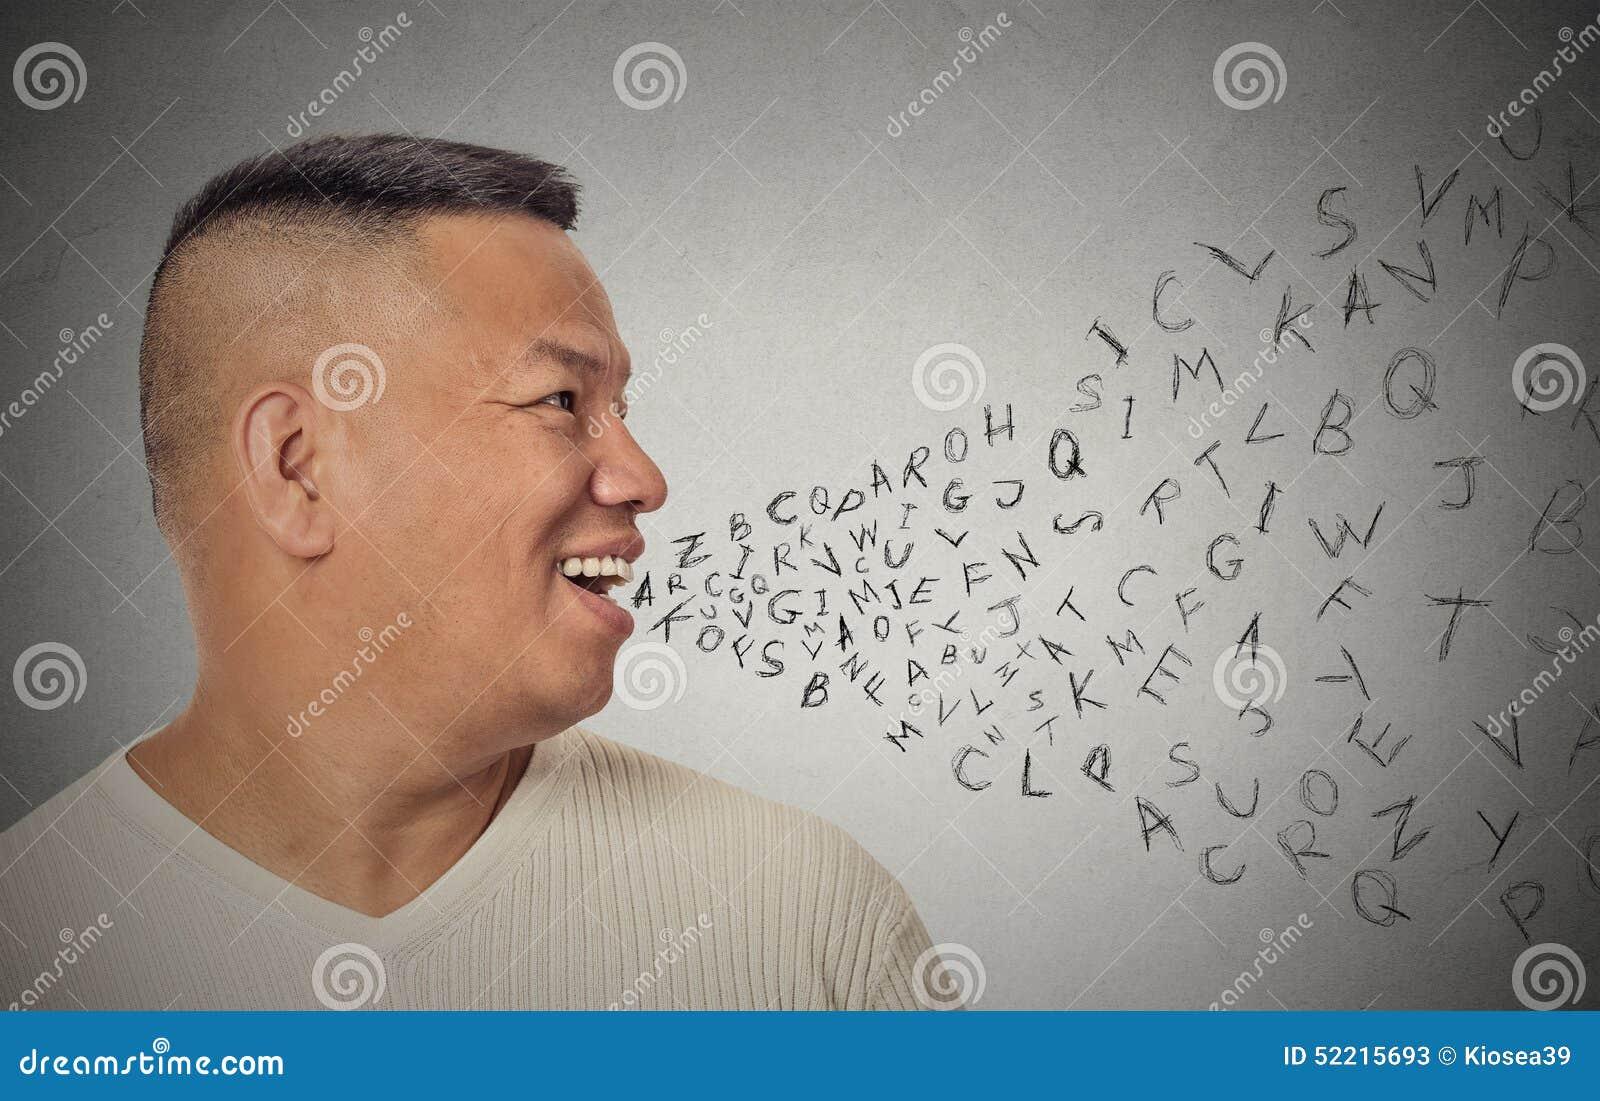 Mens die met alfabetbrieven spreken die uit open mond komen